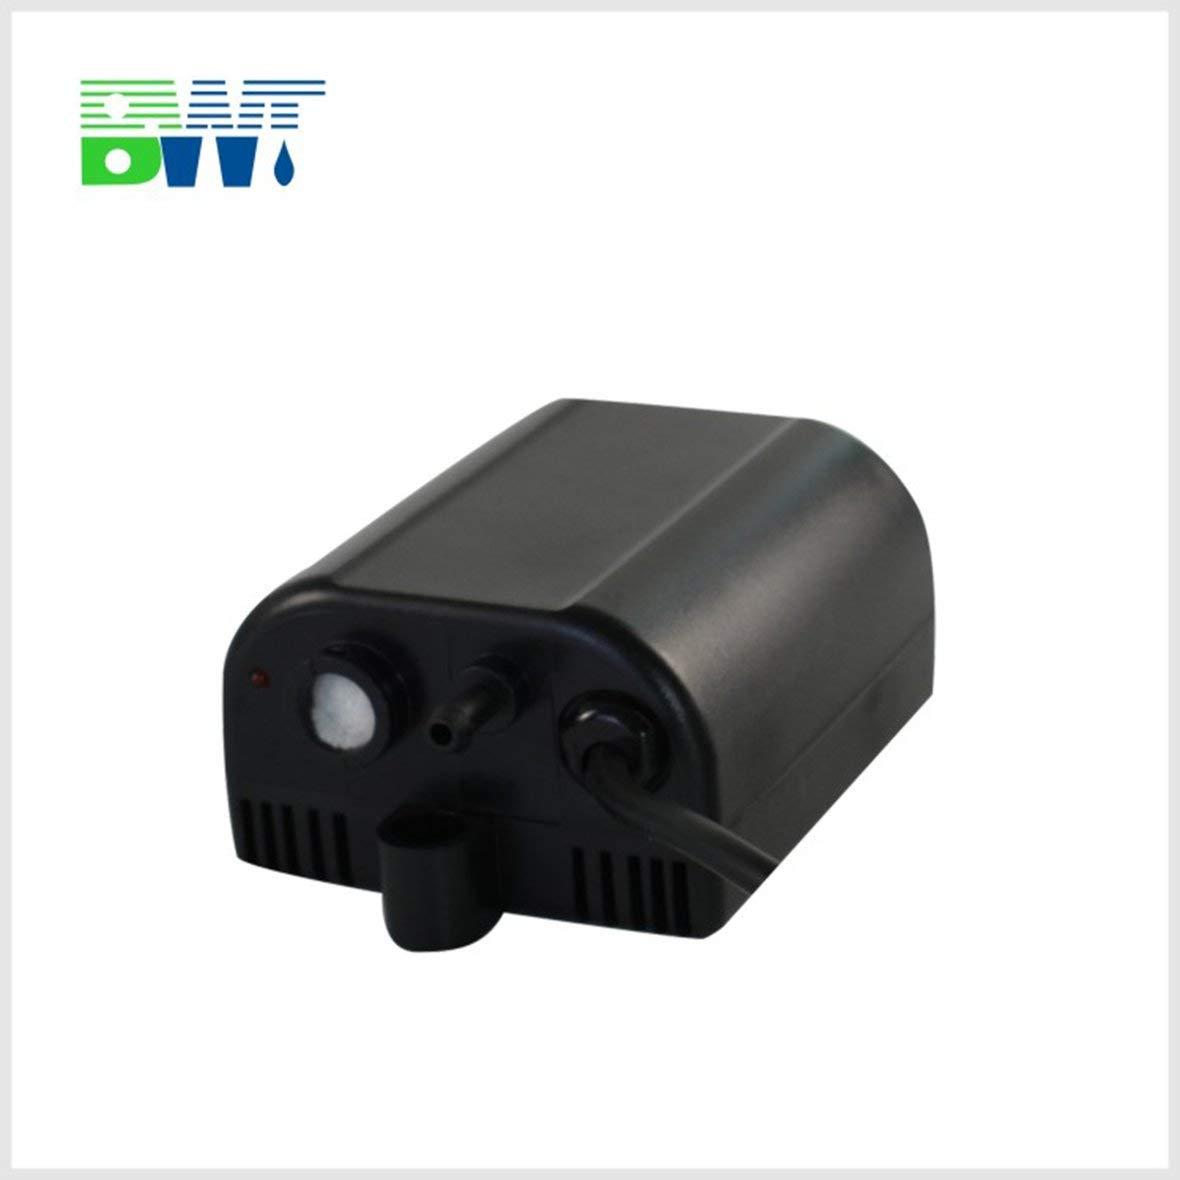 Tivolii Aquatic Ozone Generator 85-265V 6W 300mg/h Air Pool Ozonator Durable Air Purifier Small Air Conditioning Appliances